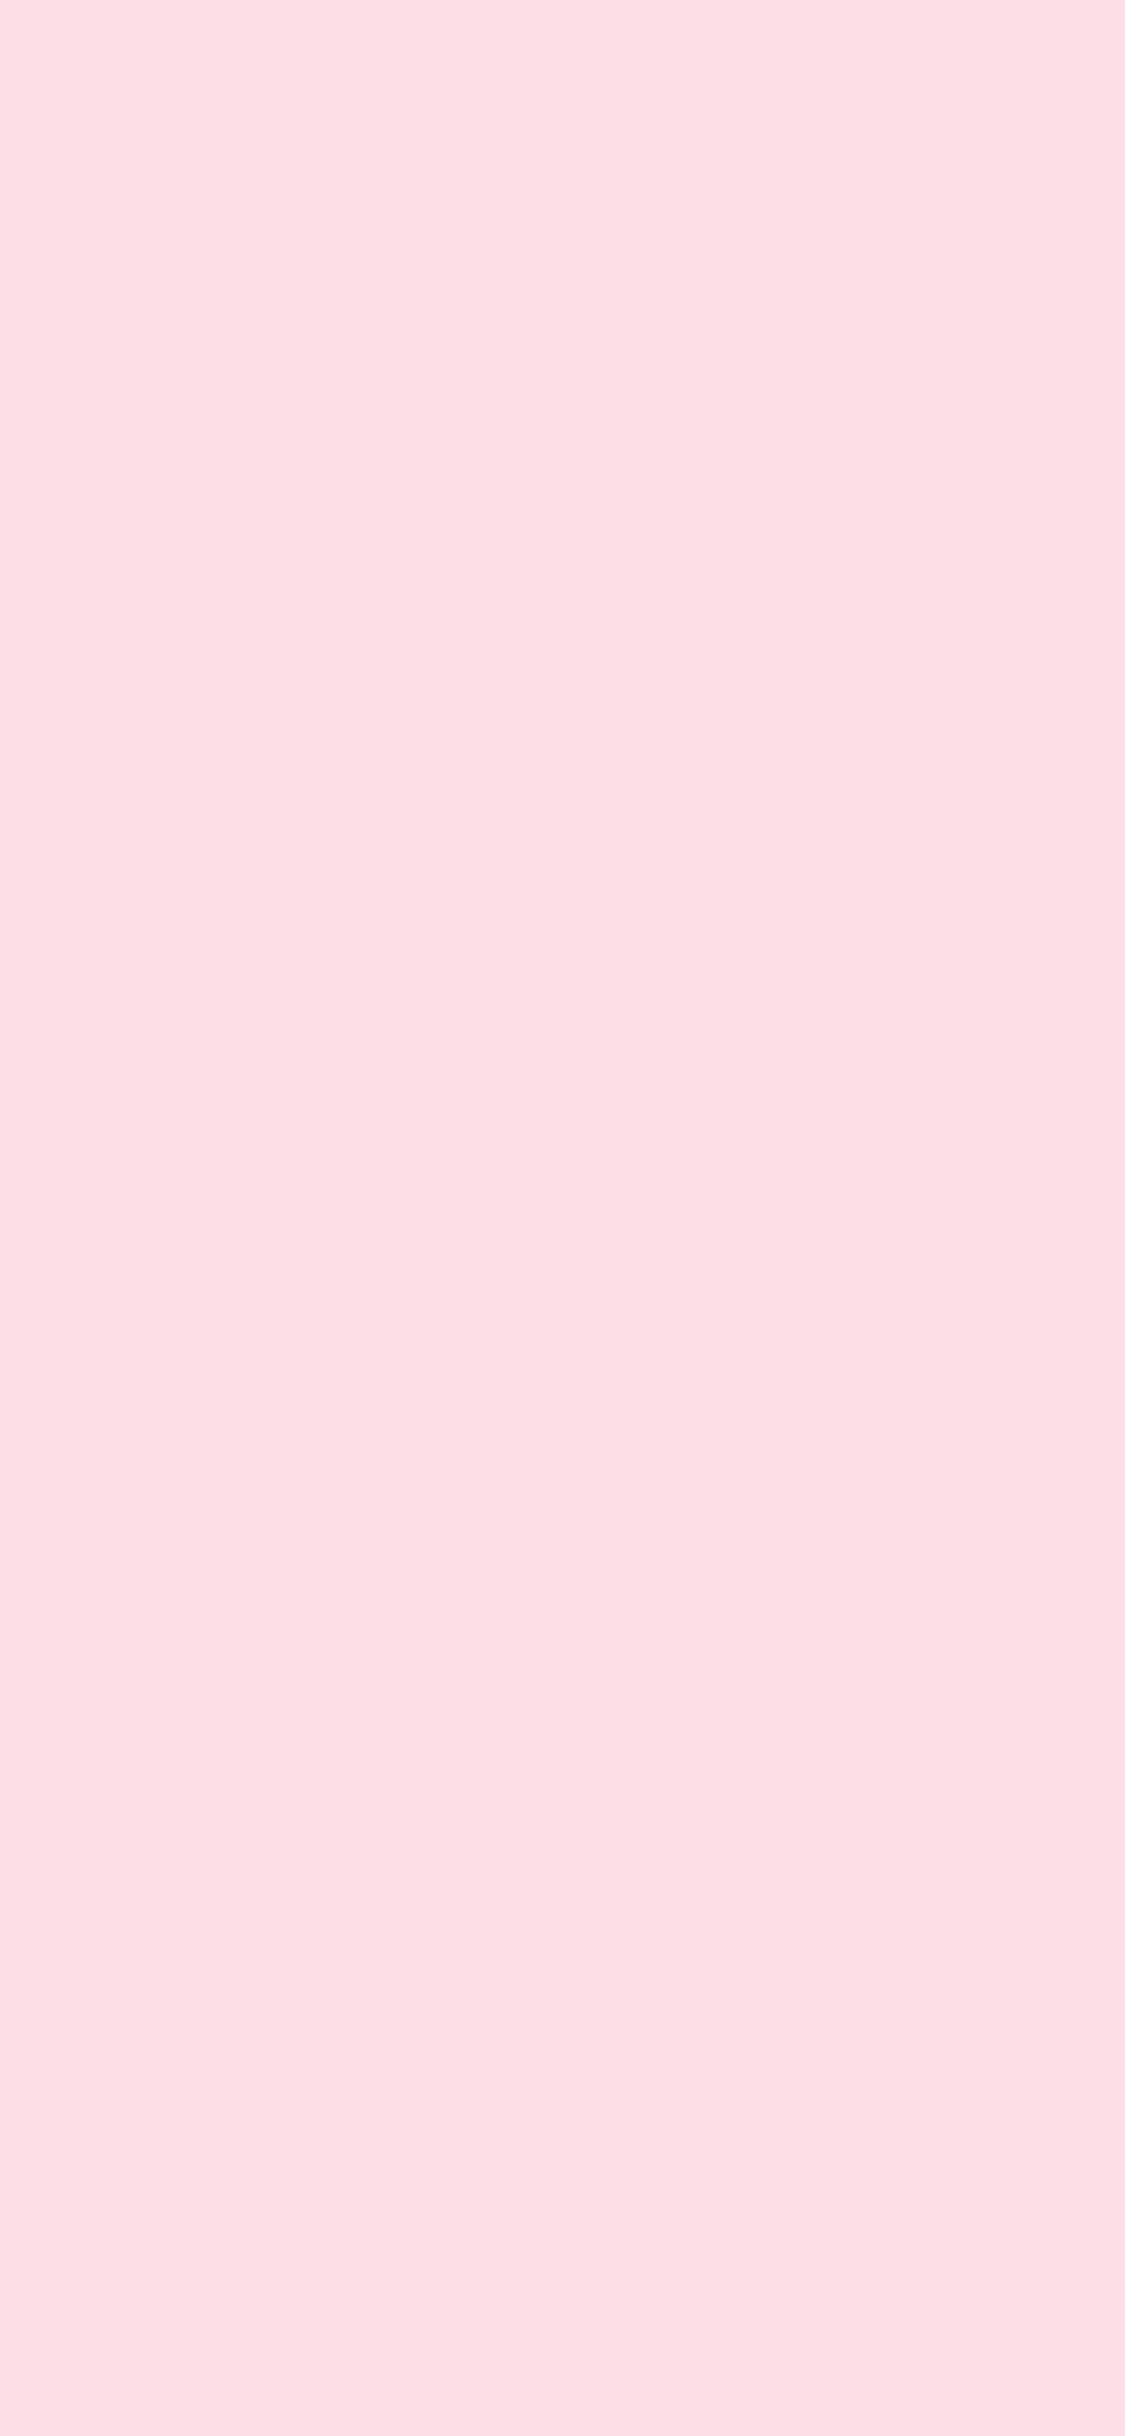 1125x2436 Piggy Pink Solid Color Background Wallpaper de